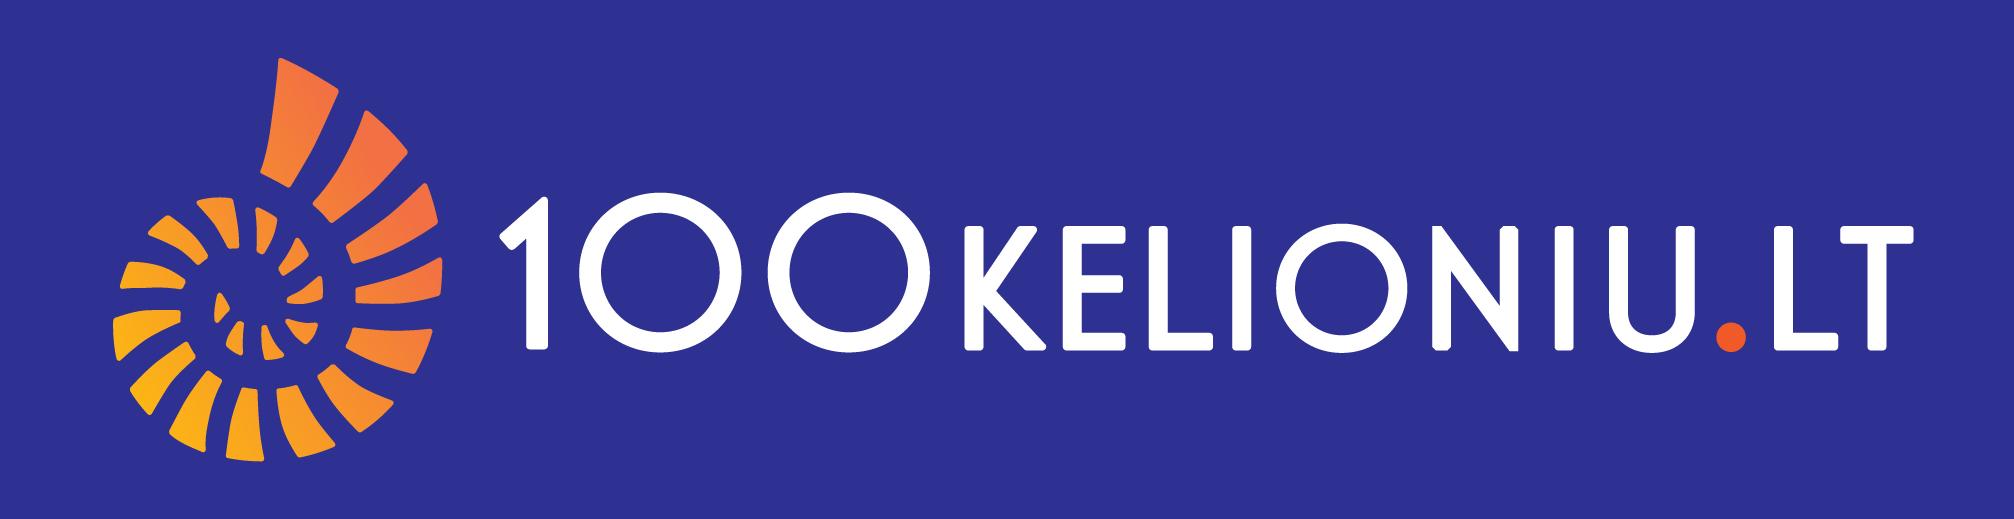 100kelioniu_logo su fonu RGB